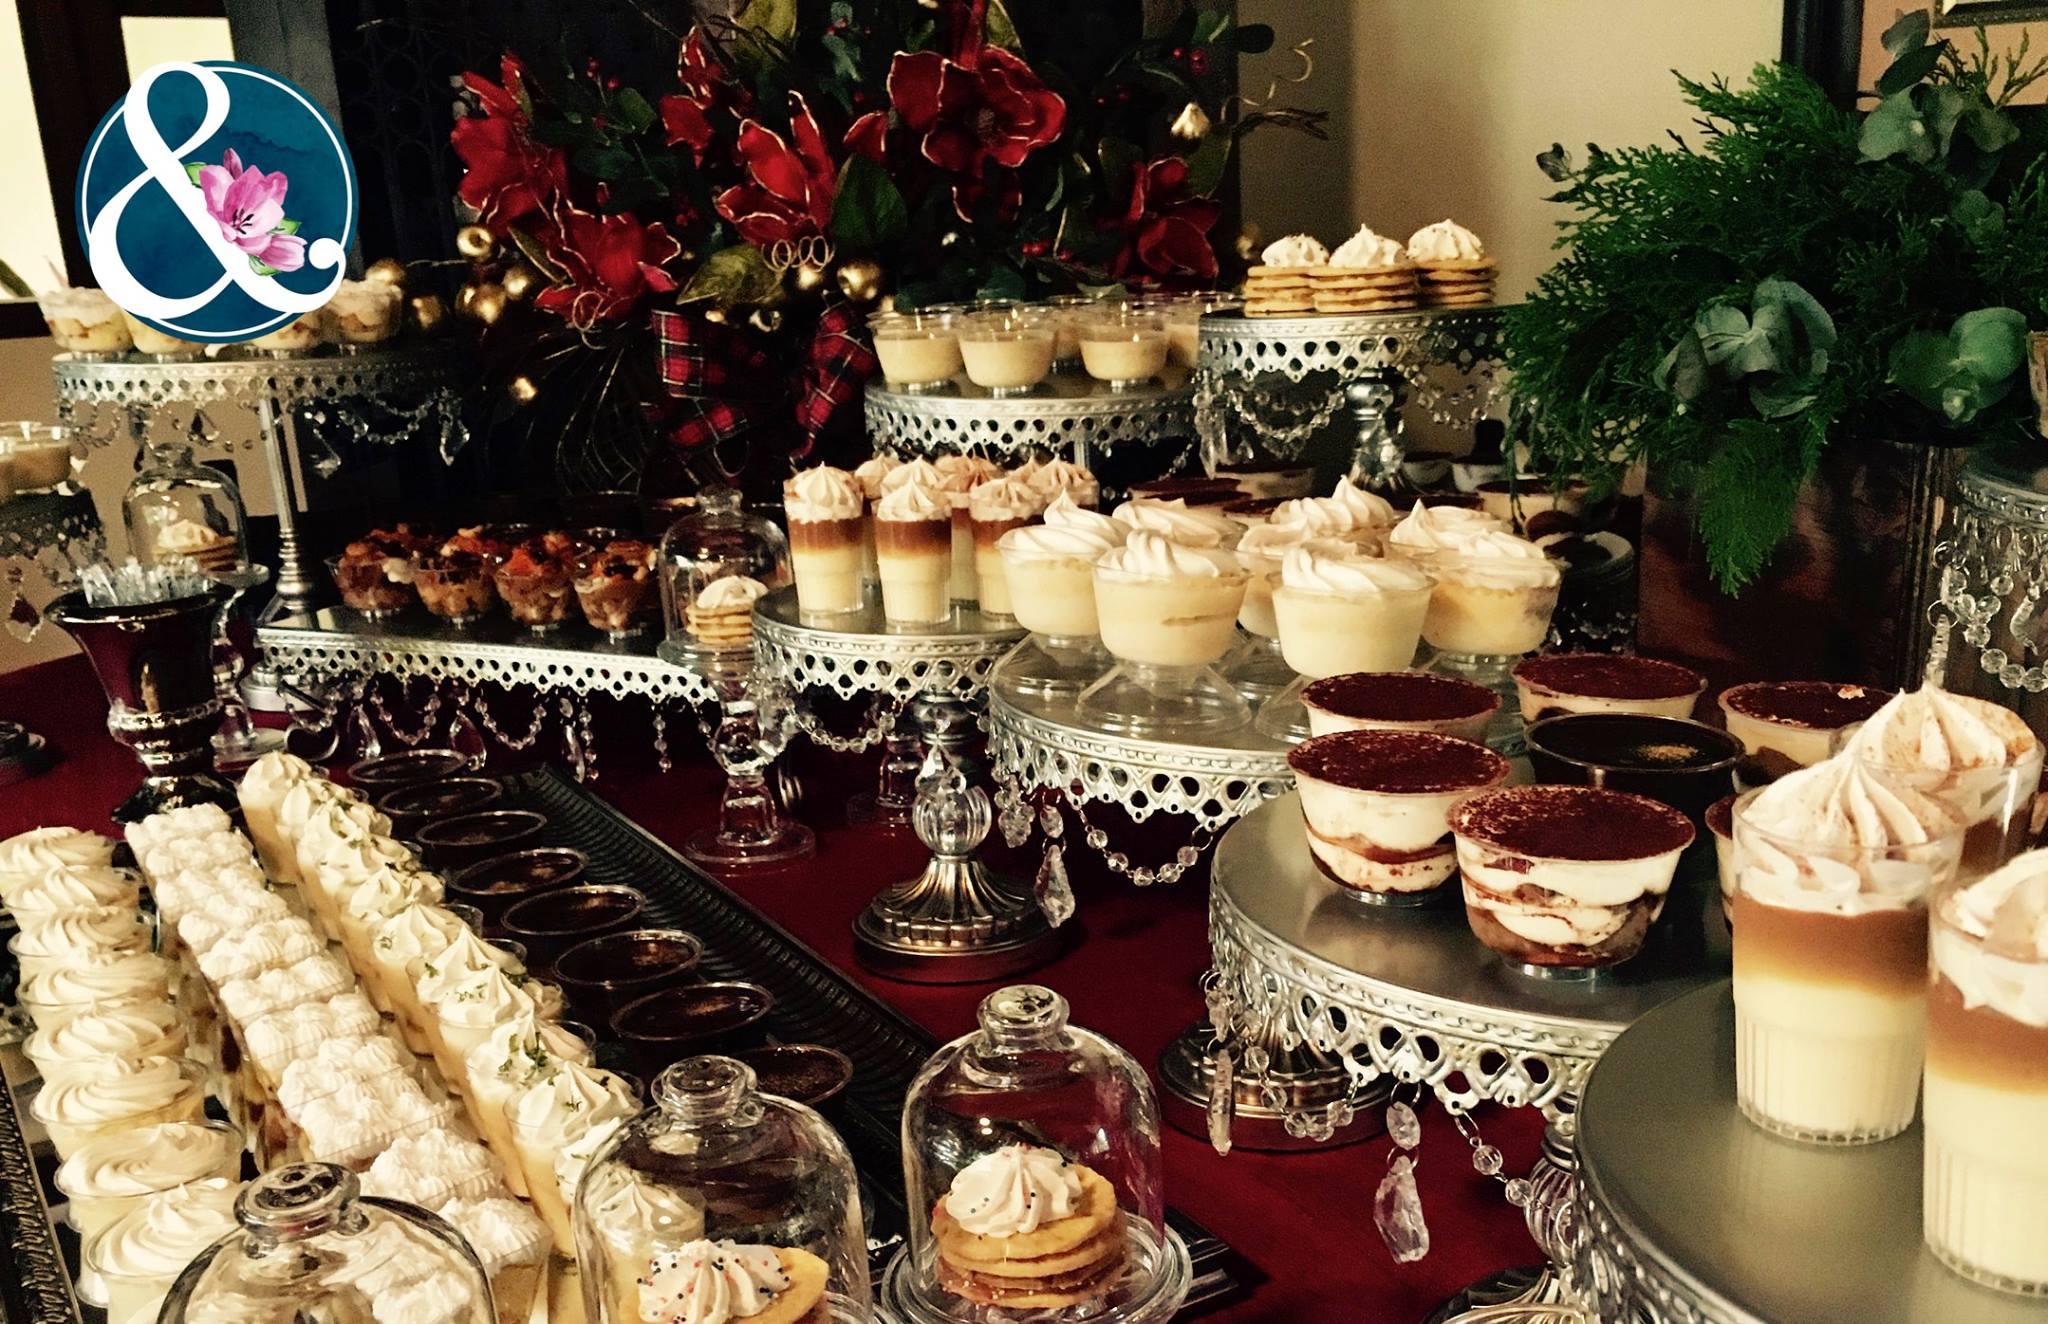 opulent treasures Cake stands dessert table.jpg